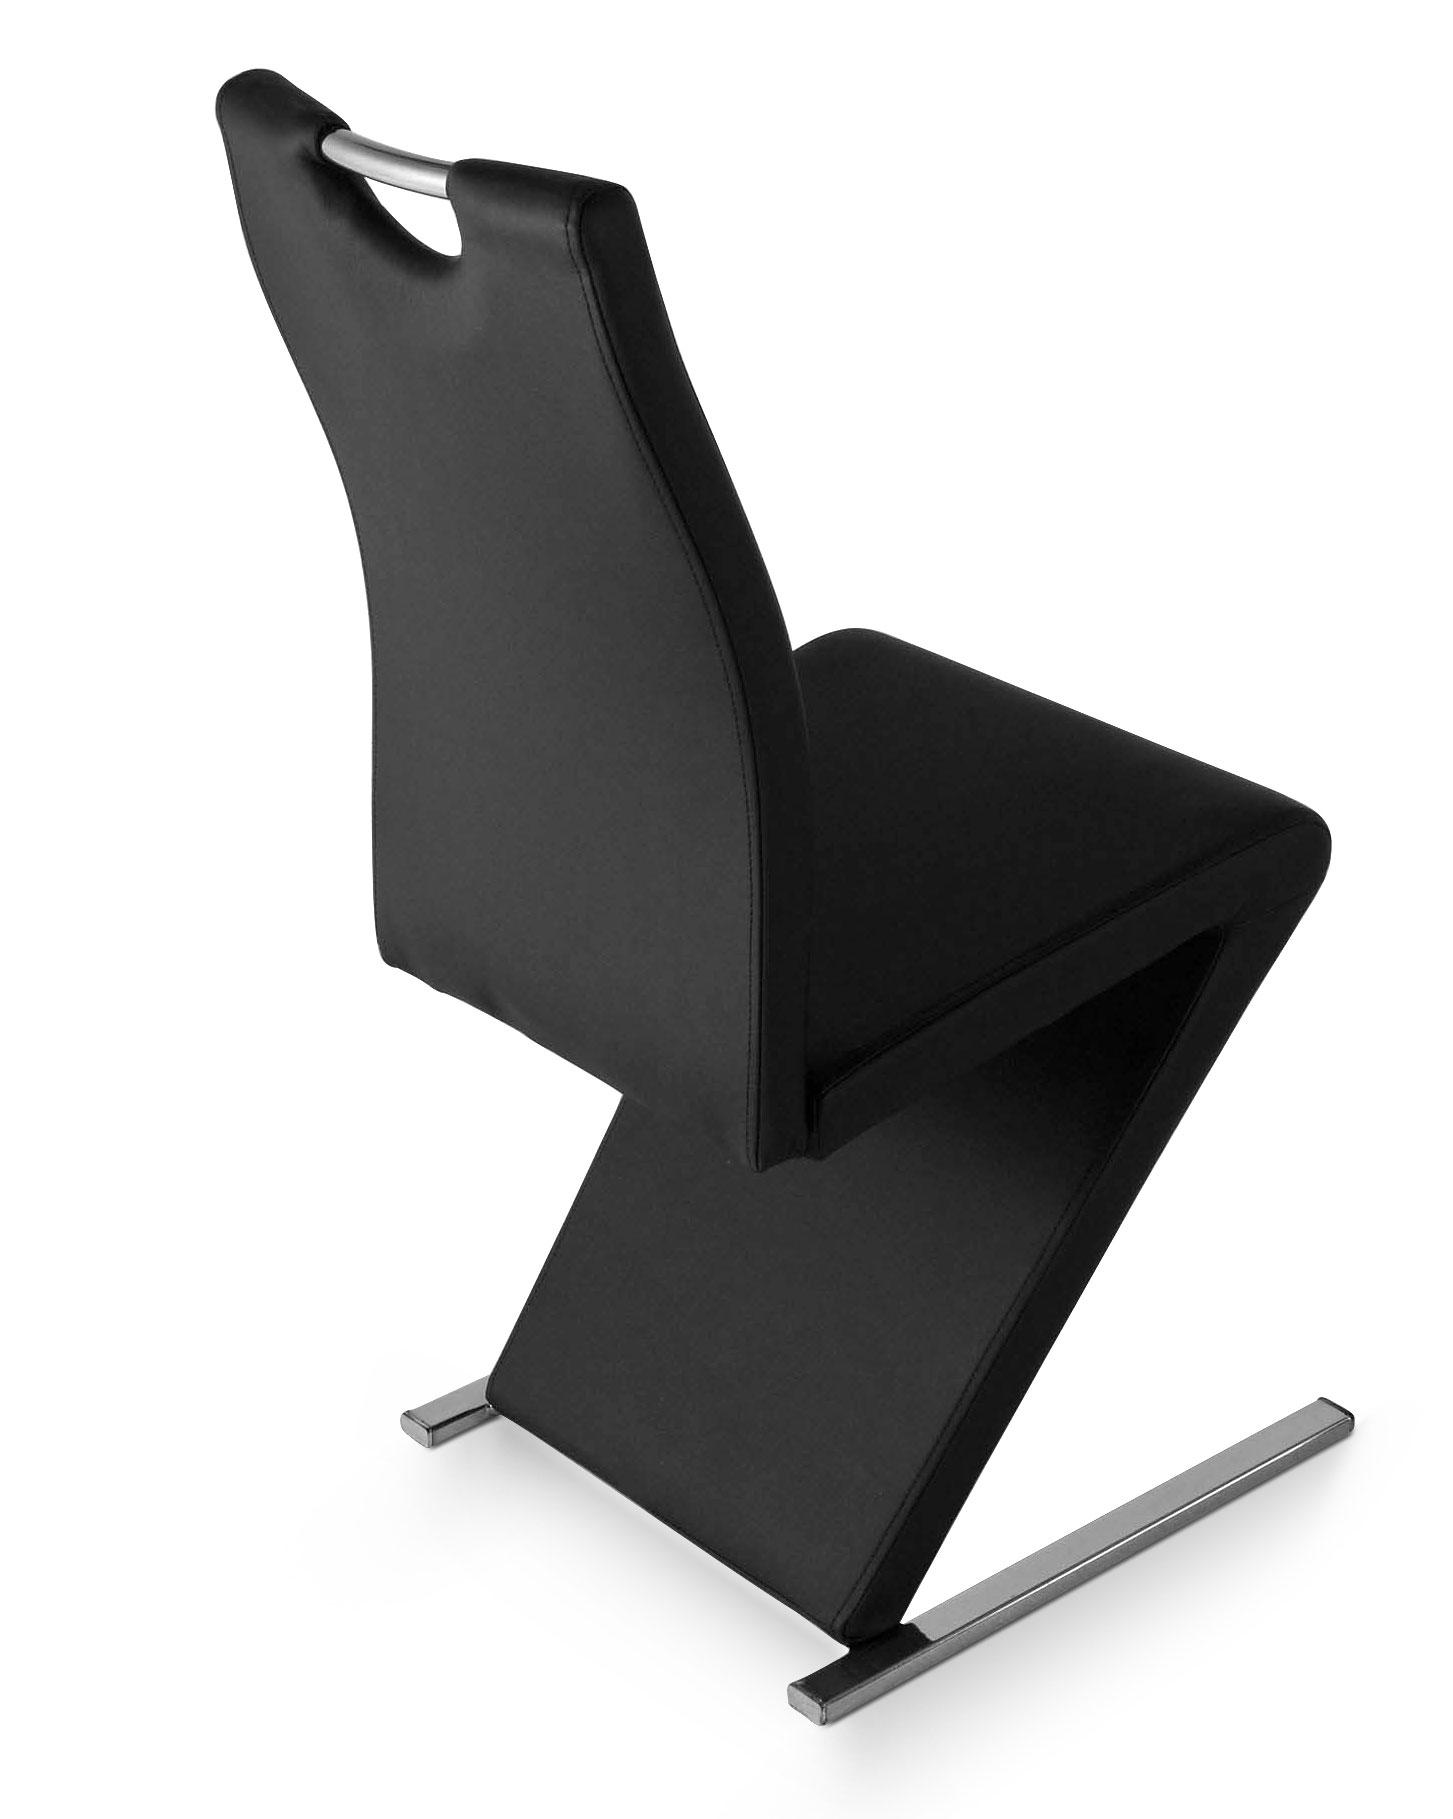 sam design freischwinger stuhl schwarz metall jana. Black Bedroom Furniture Sets. Home Design Ideas